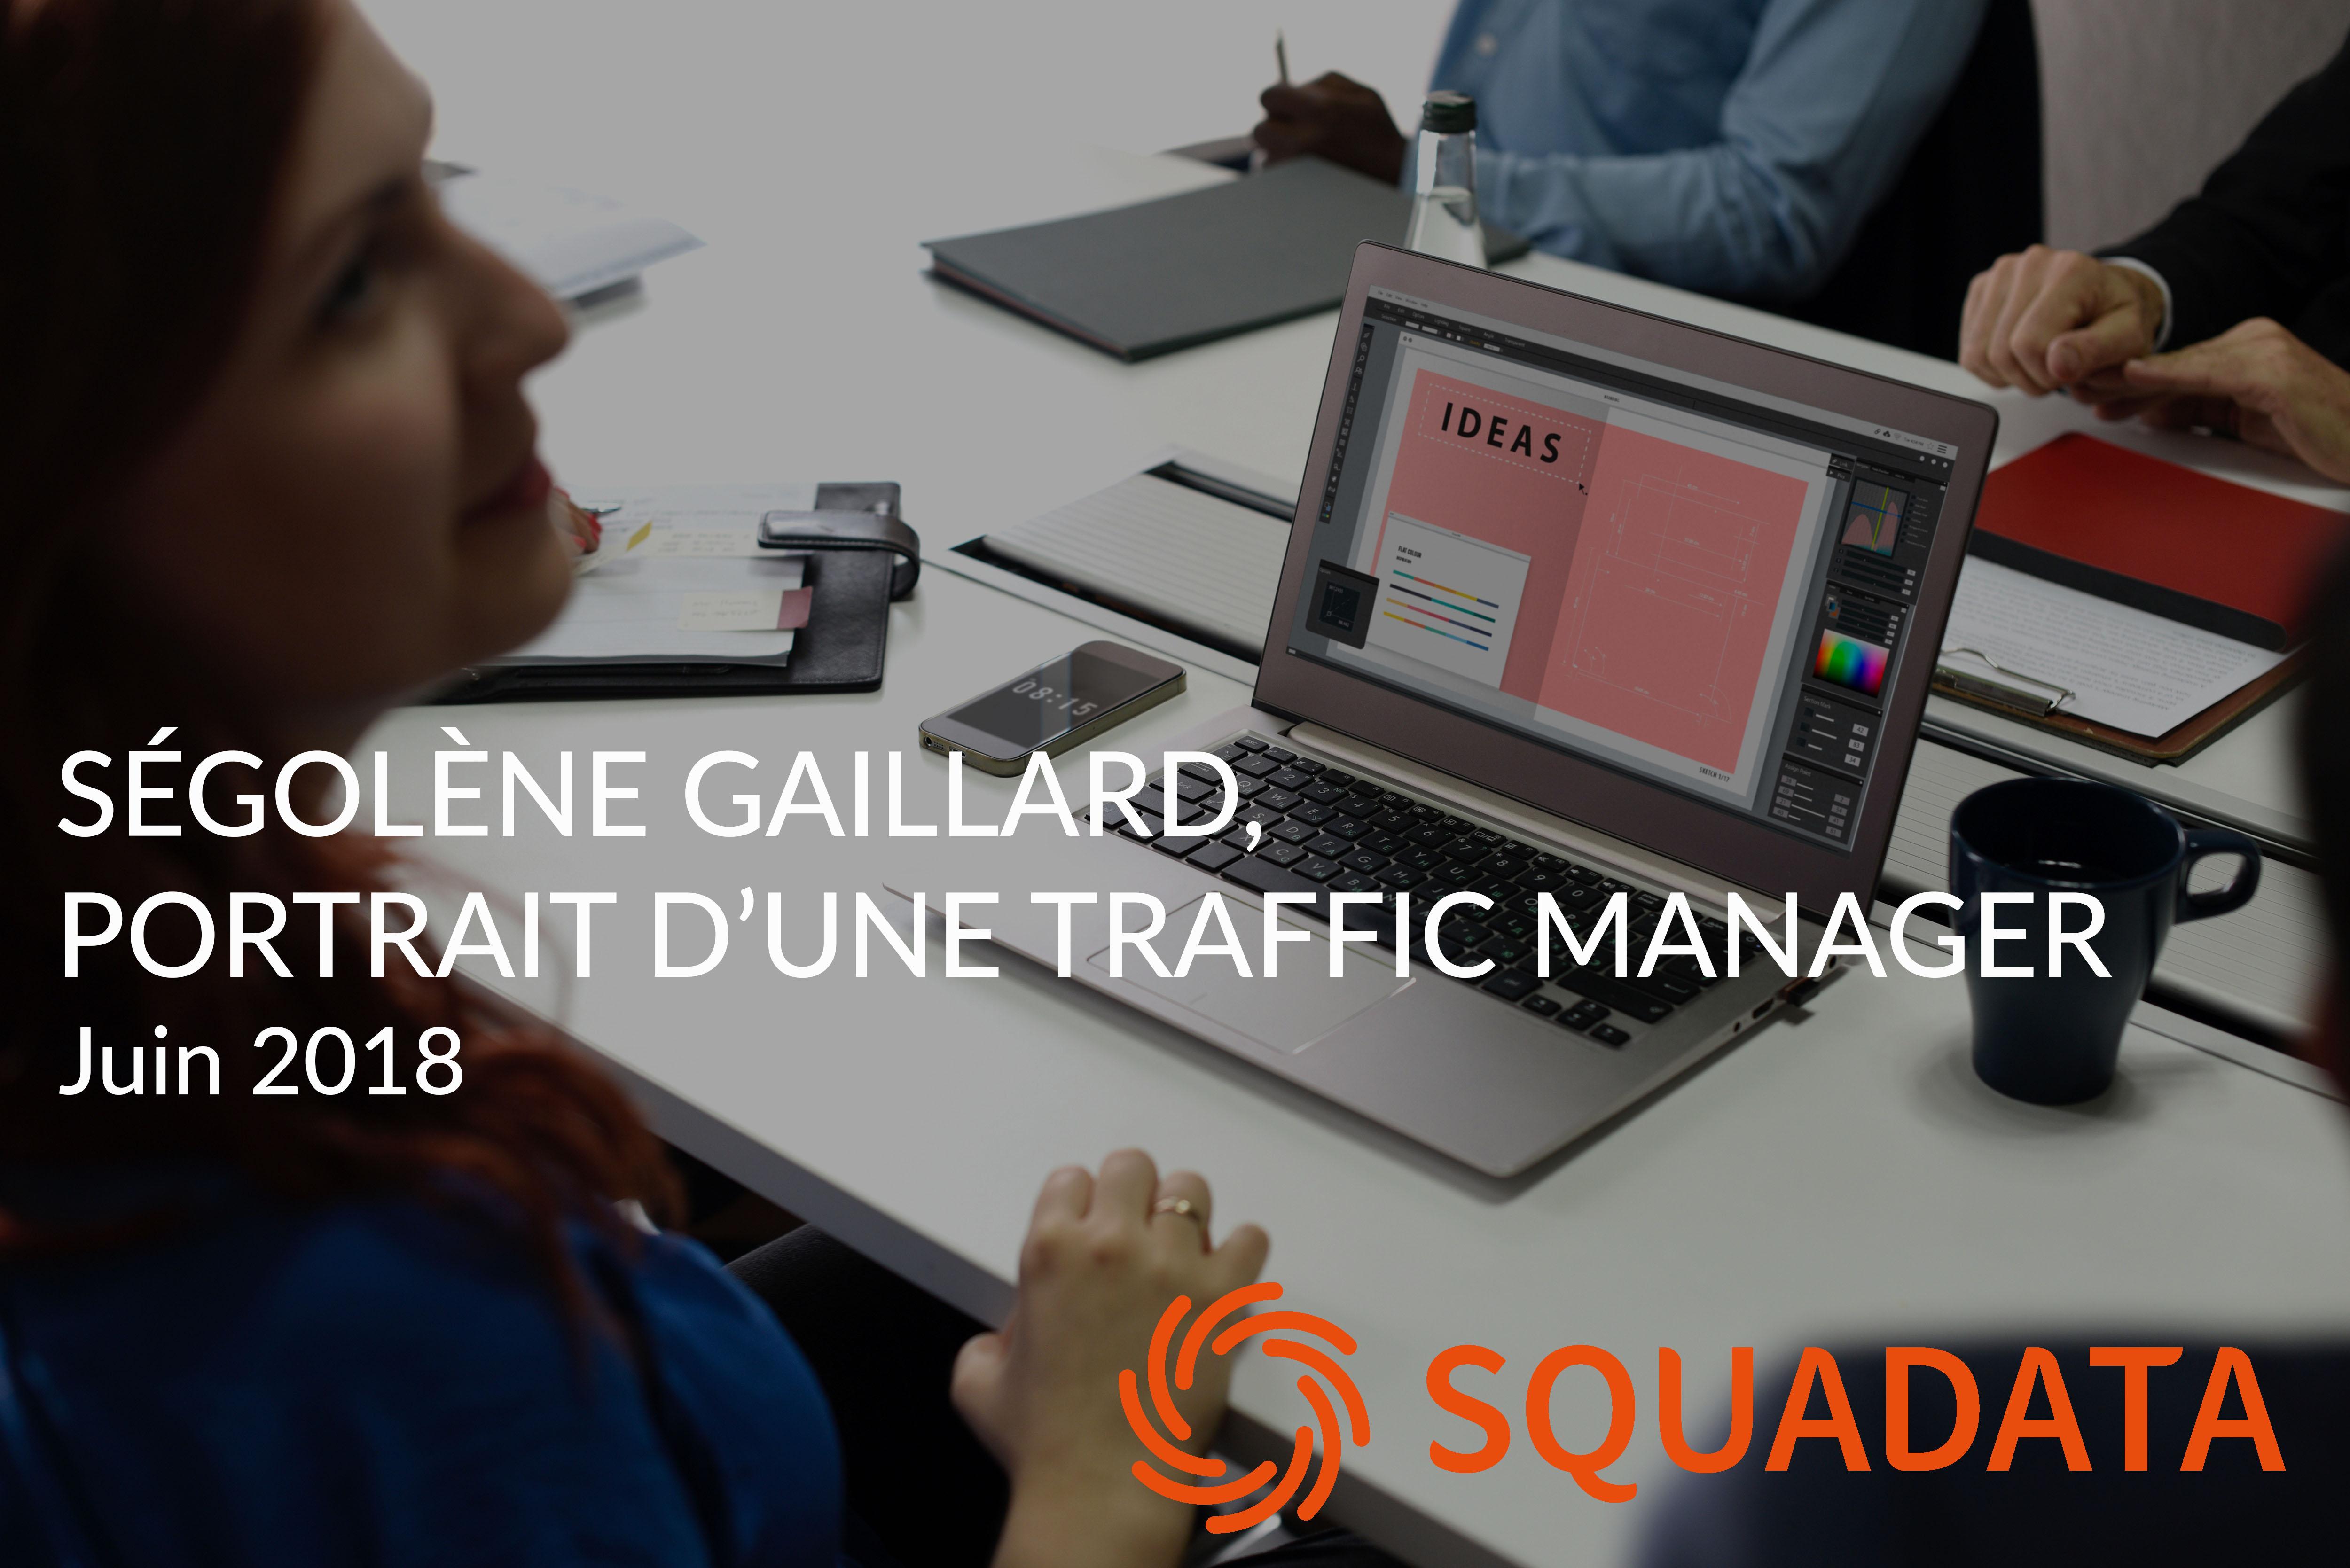 Ségolène Gaillard Traffic Manager chez Squadata